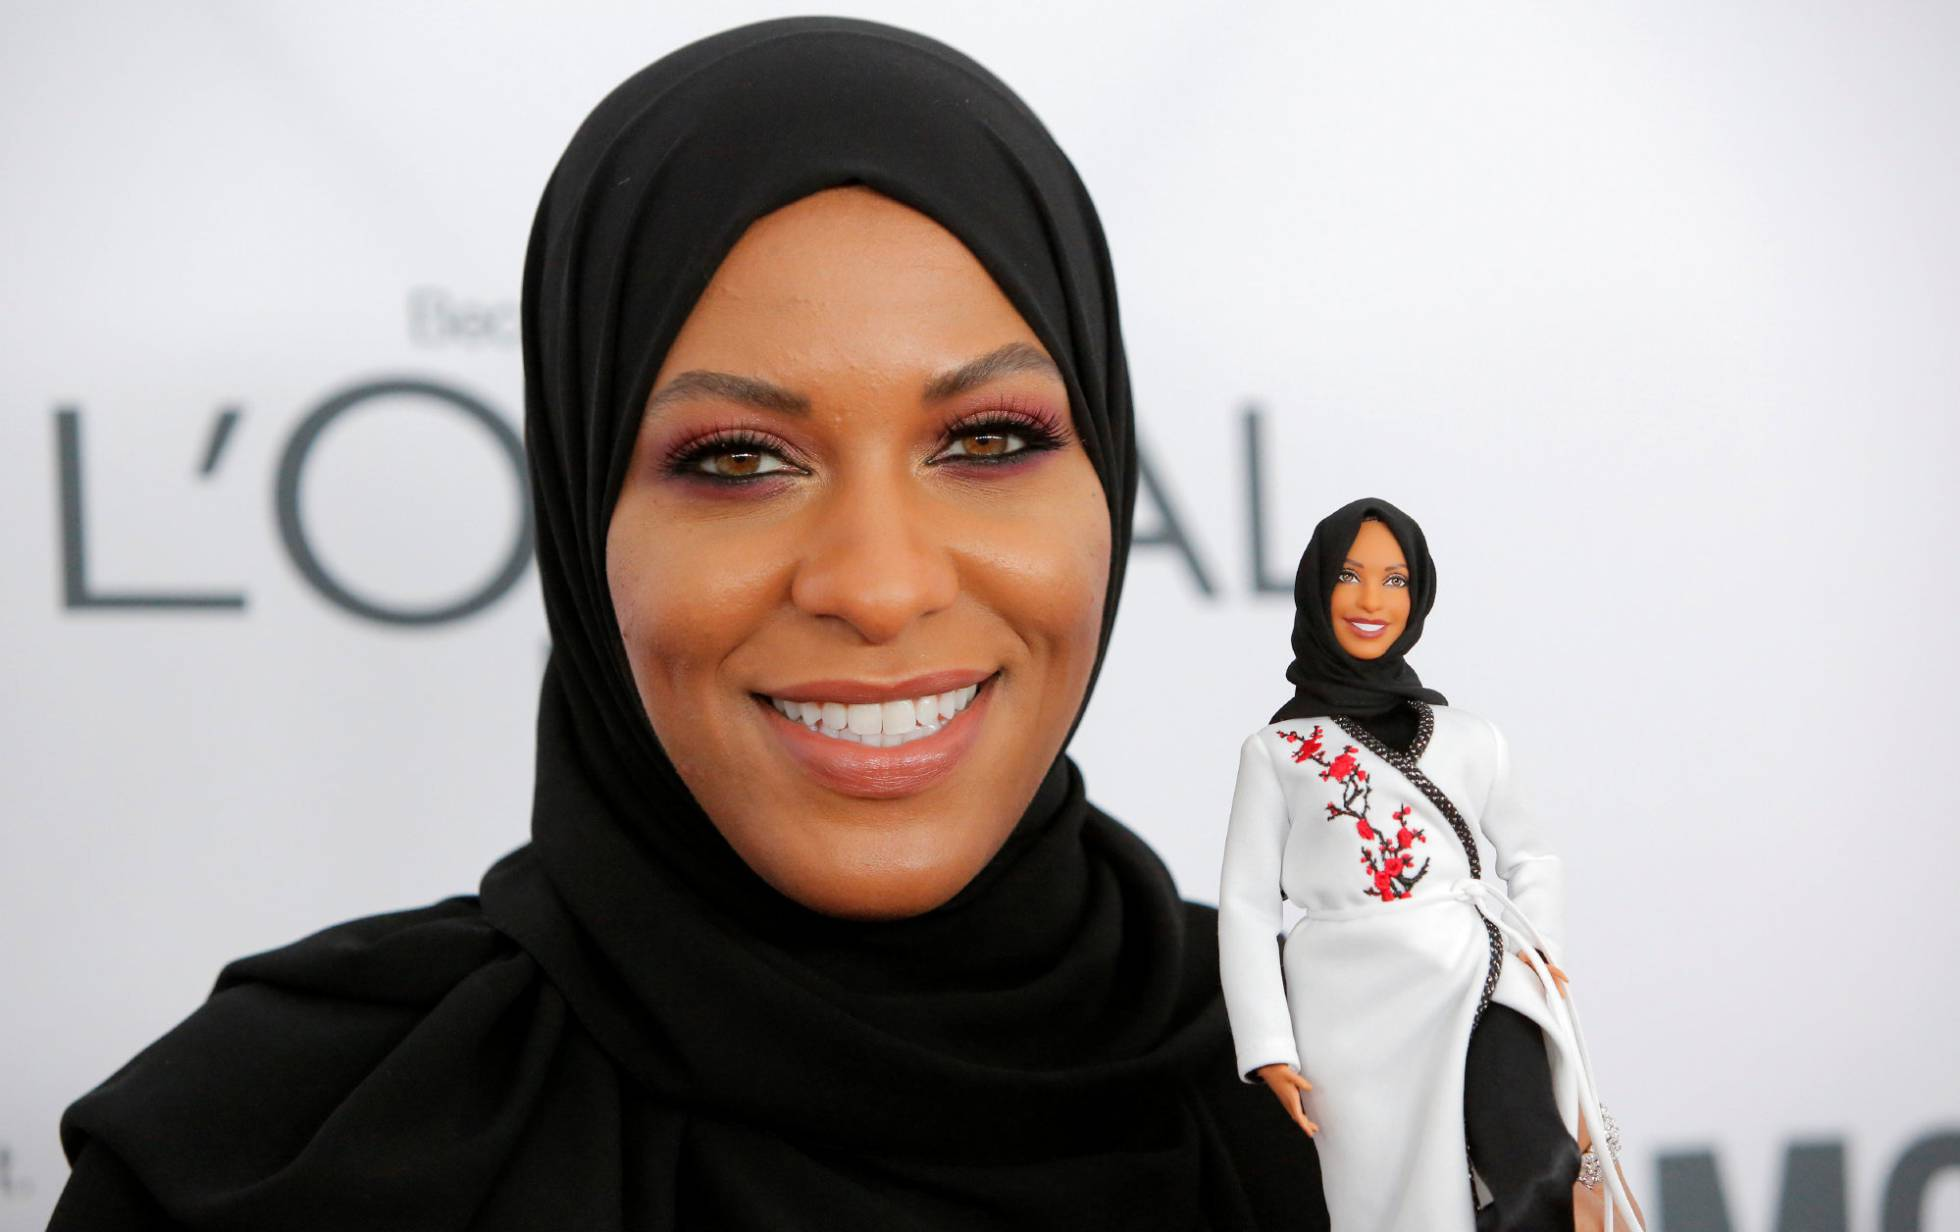 barbie con hiyab